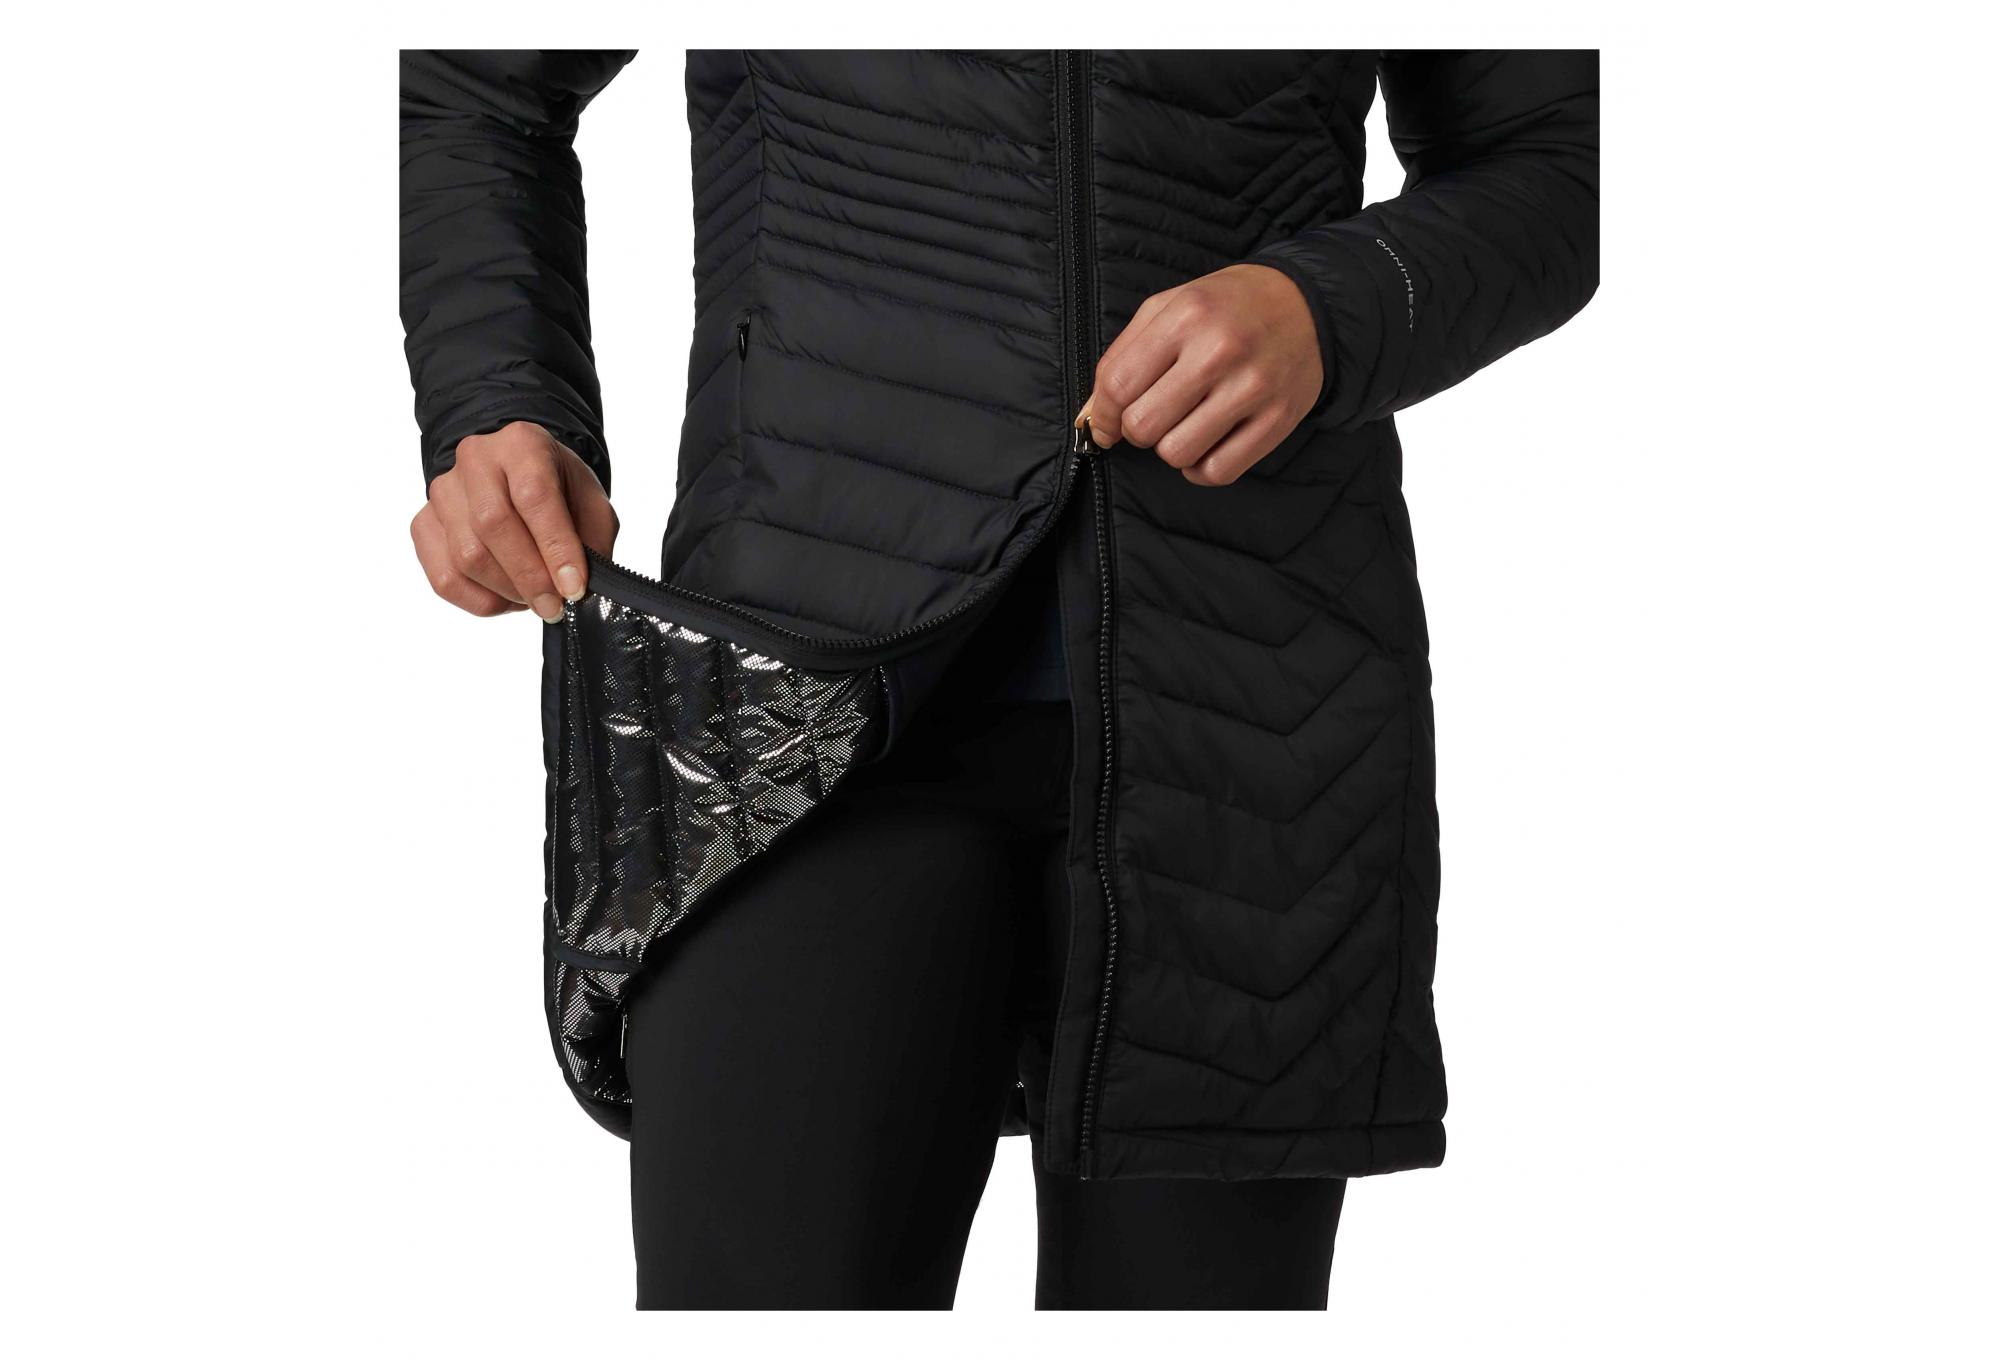 COLUMBIA Powder Lite Mid Jacket Women's Black